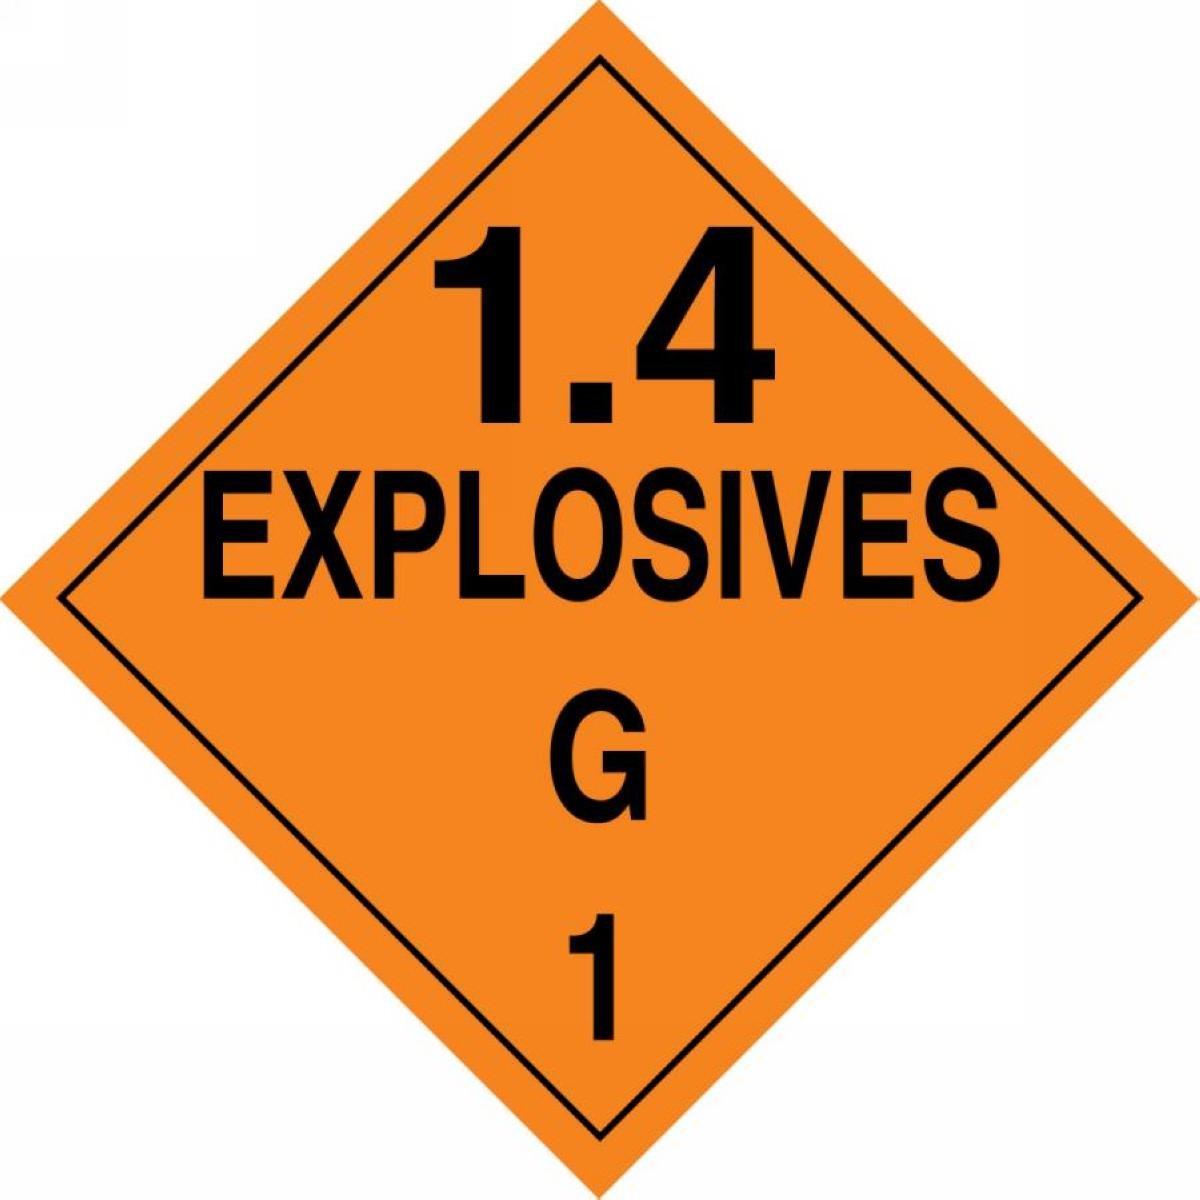 Accuform Signs MPL132VS1 Adhesive Vinyl Hazard Class 1/Division 4G DOT Placard, Legend '1.4 EXPLOSIVES G 1', 10-3/4' Width x 10-3/4' Length, Black on Orange Legend 1.4 EXPLOSIVES G 1 10-3/4 Width x 10-3/4 Length